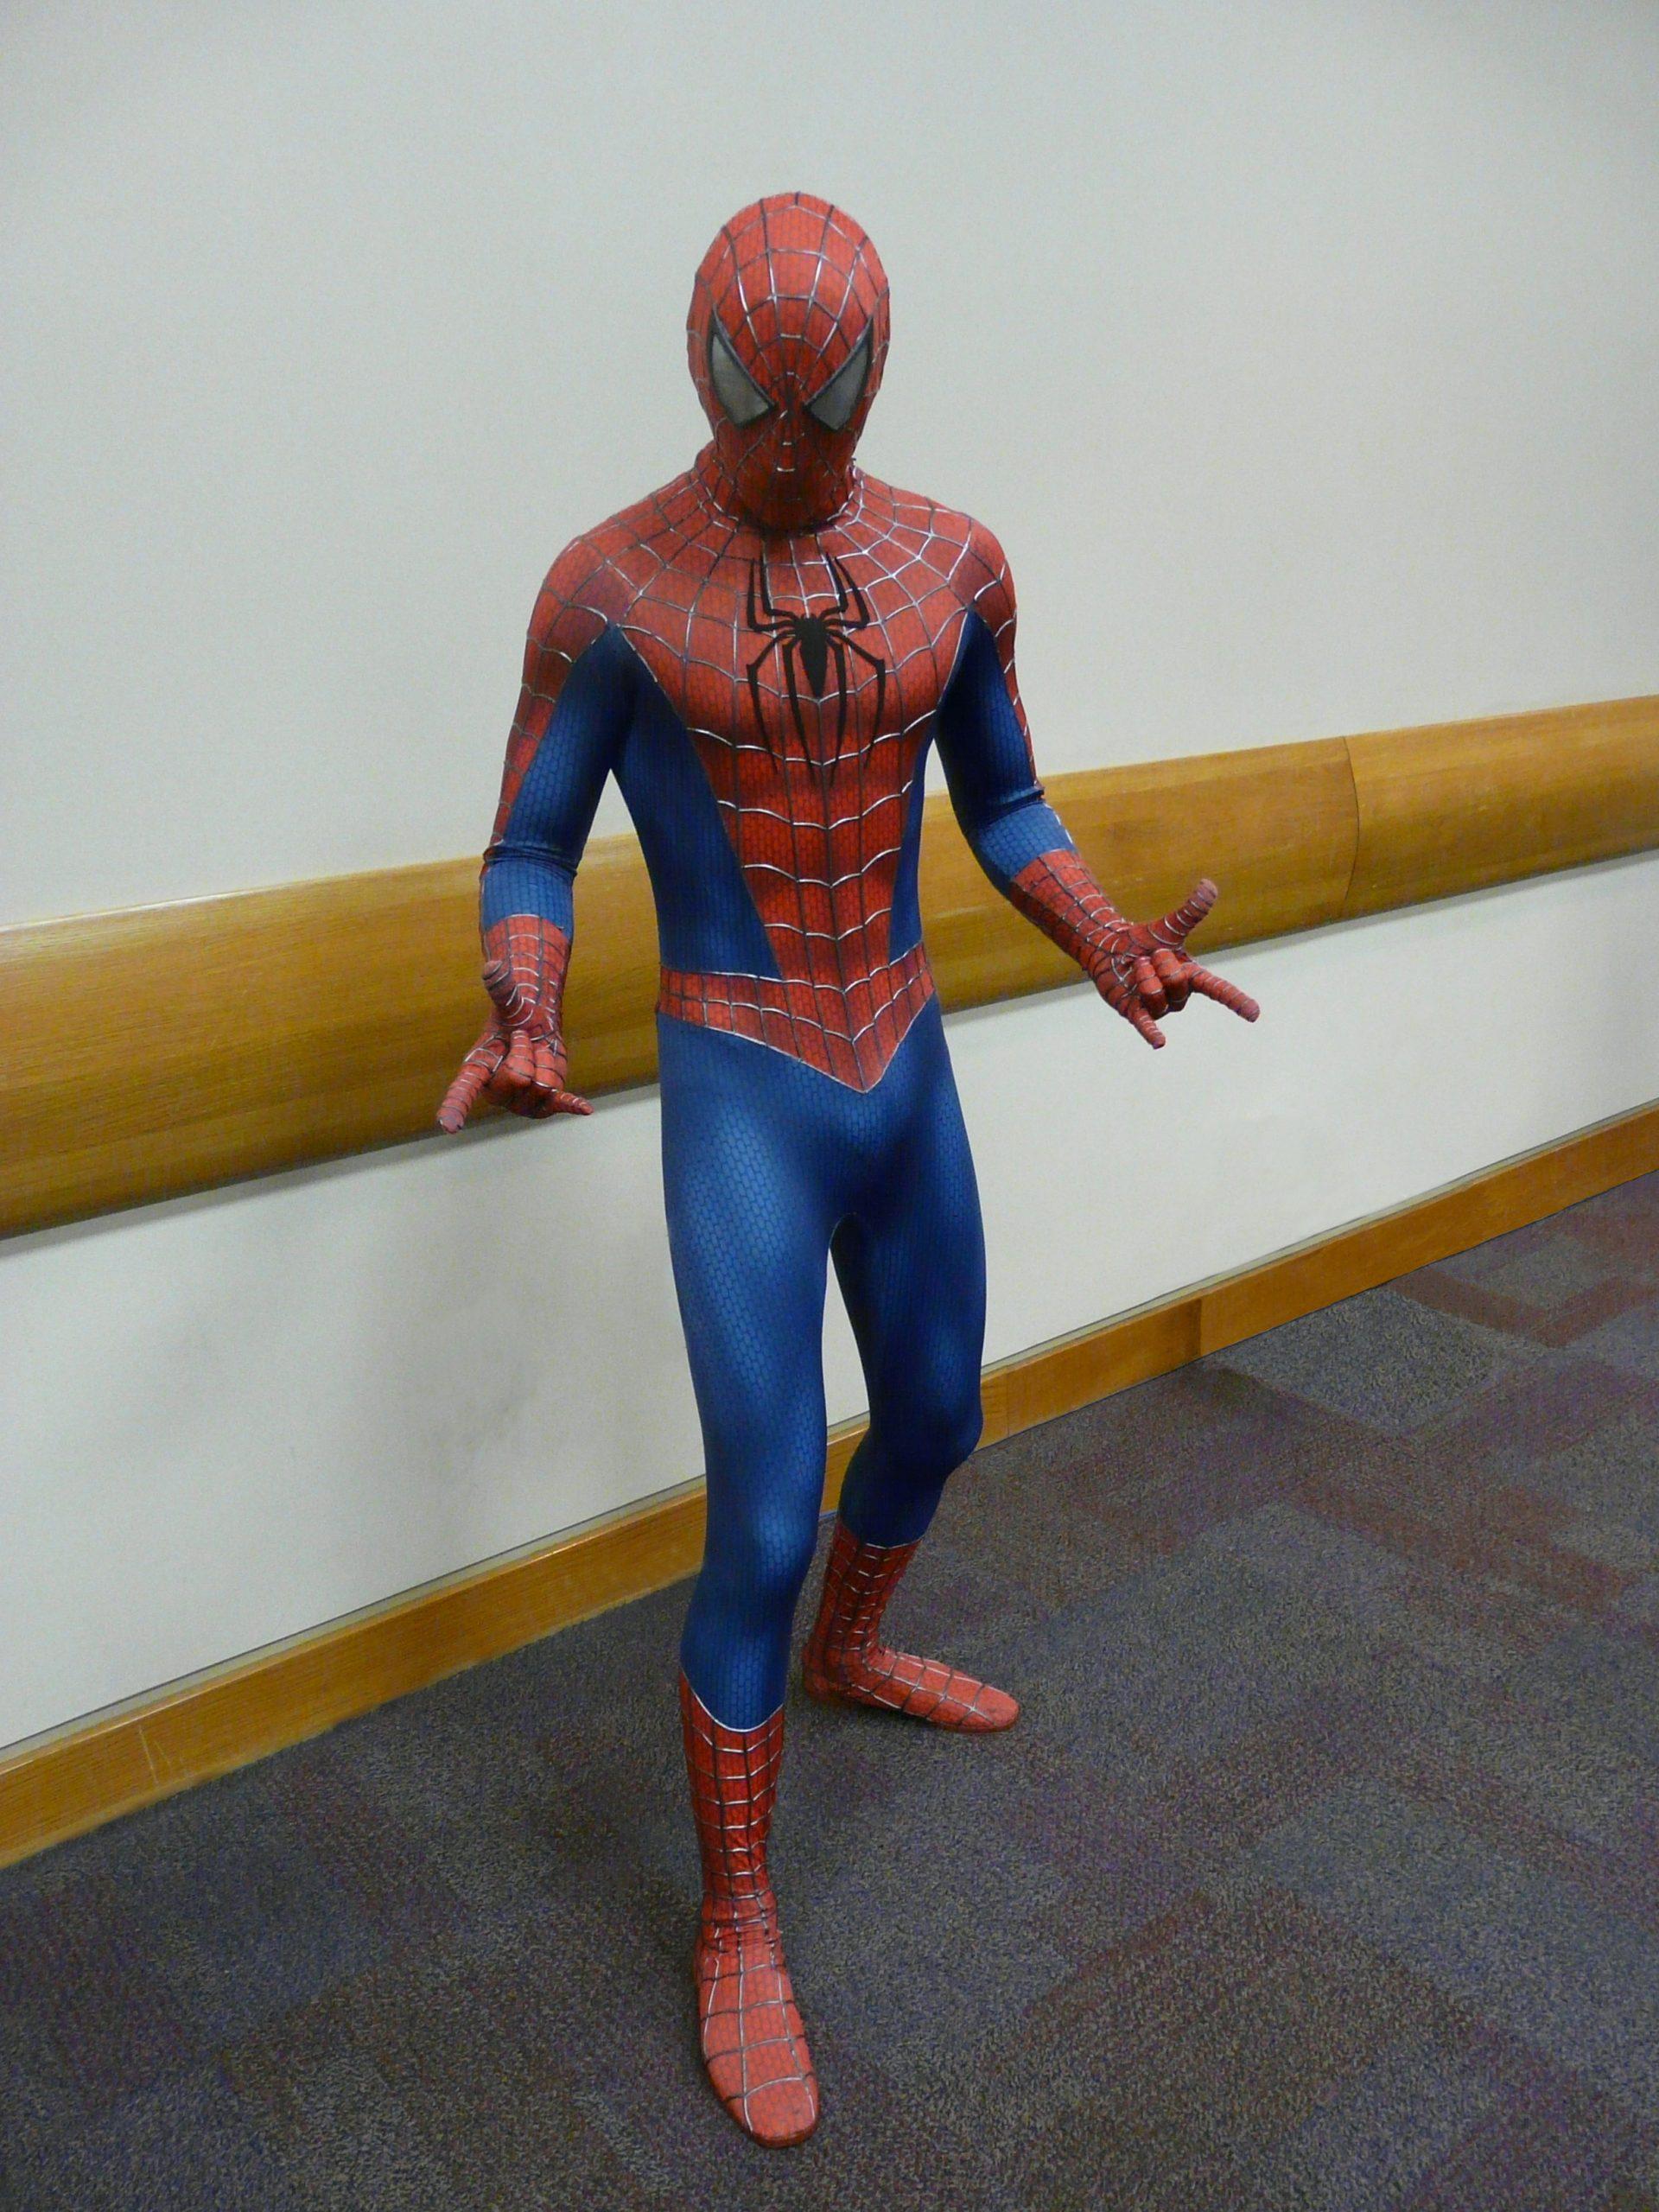 Spider-Man — Wikipédia concernant Tete Spiderman A Imprimer